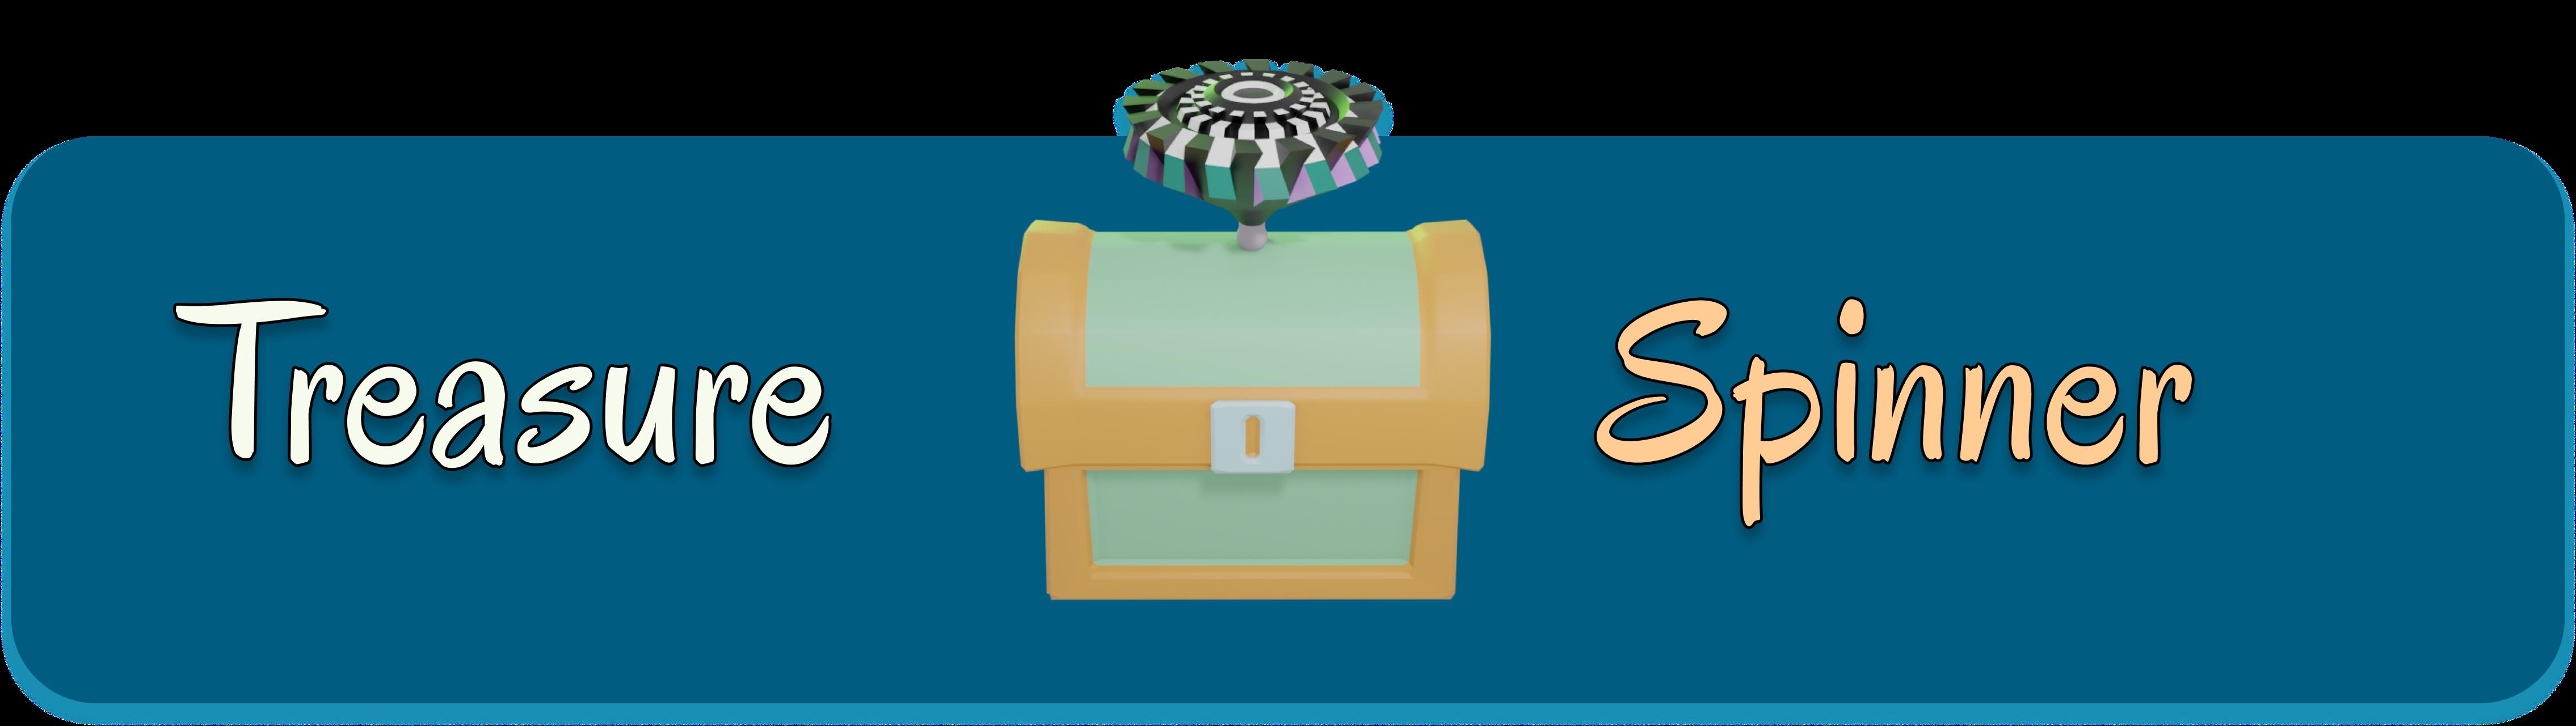 Treasure Spinner